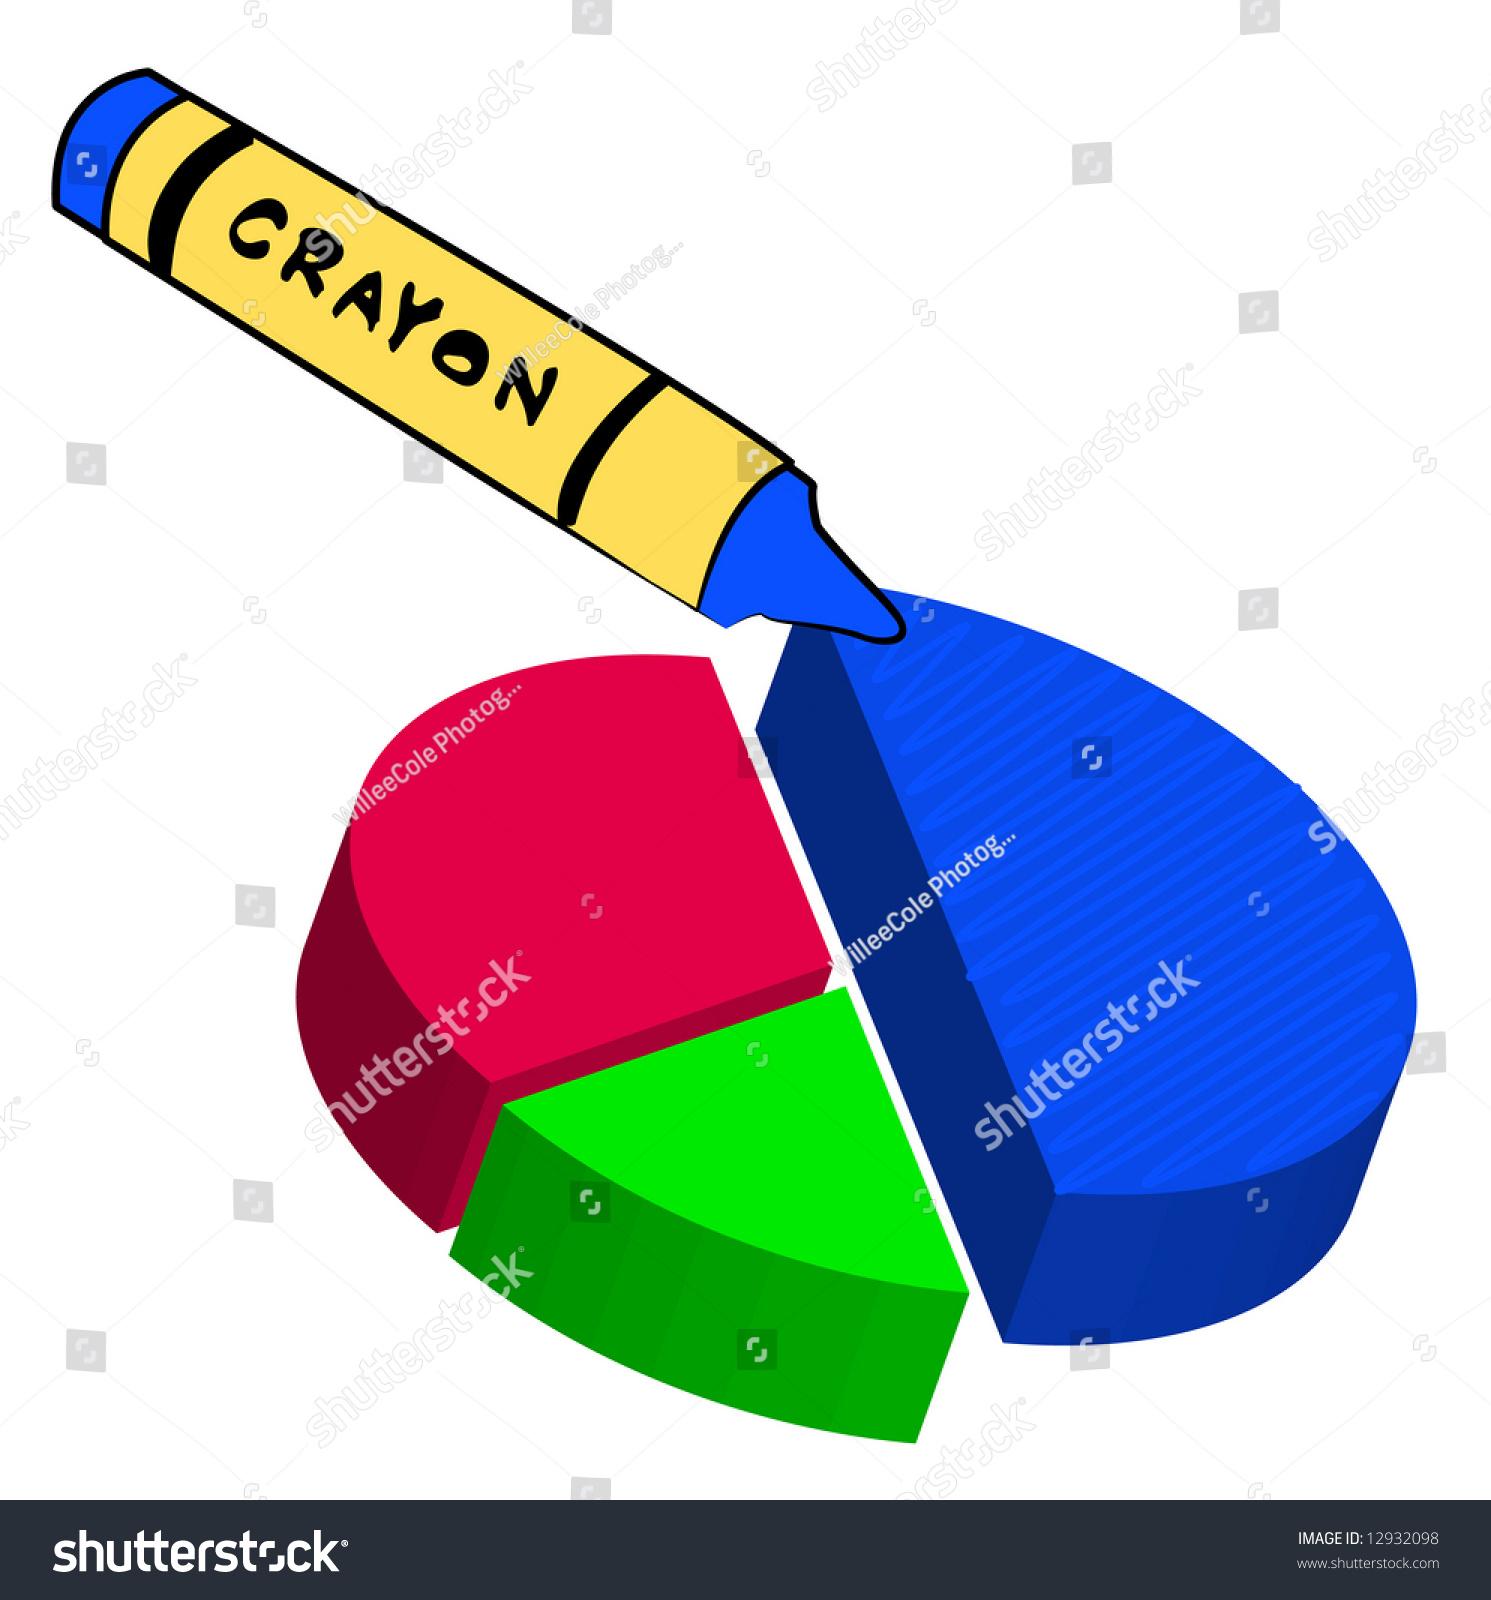 Crayon Colored Circle : Blue wax crayon filling in circle graph stock photo